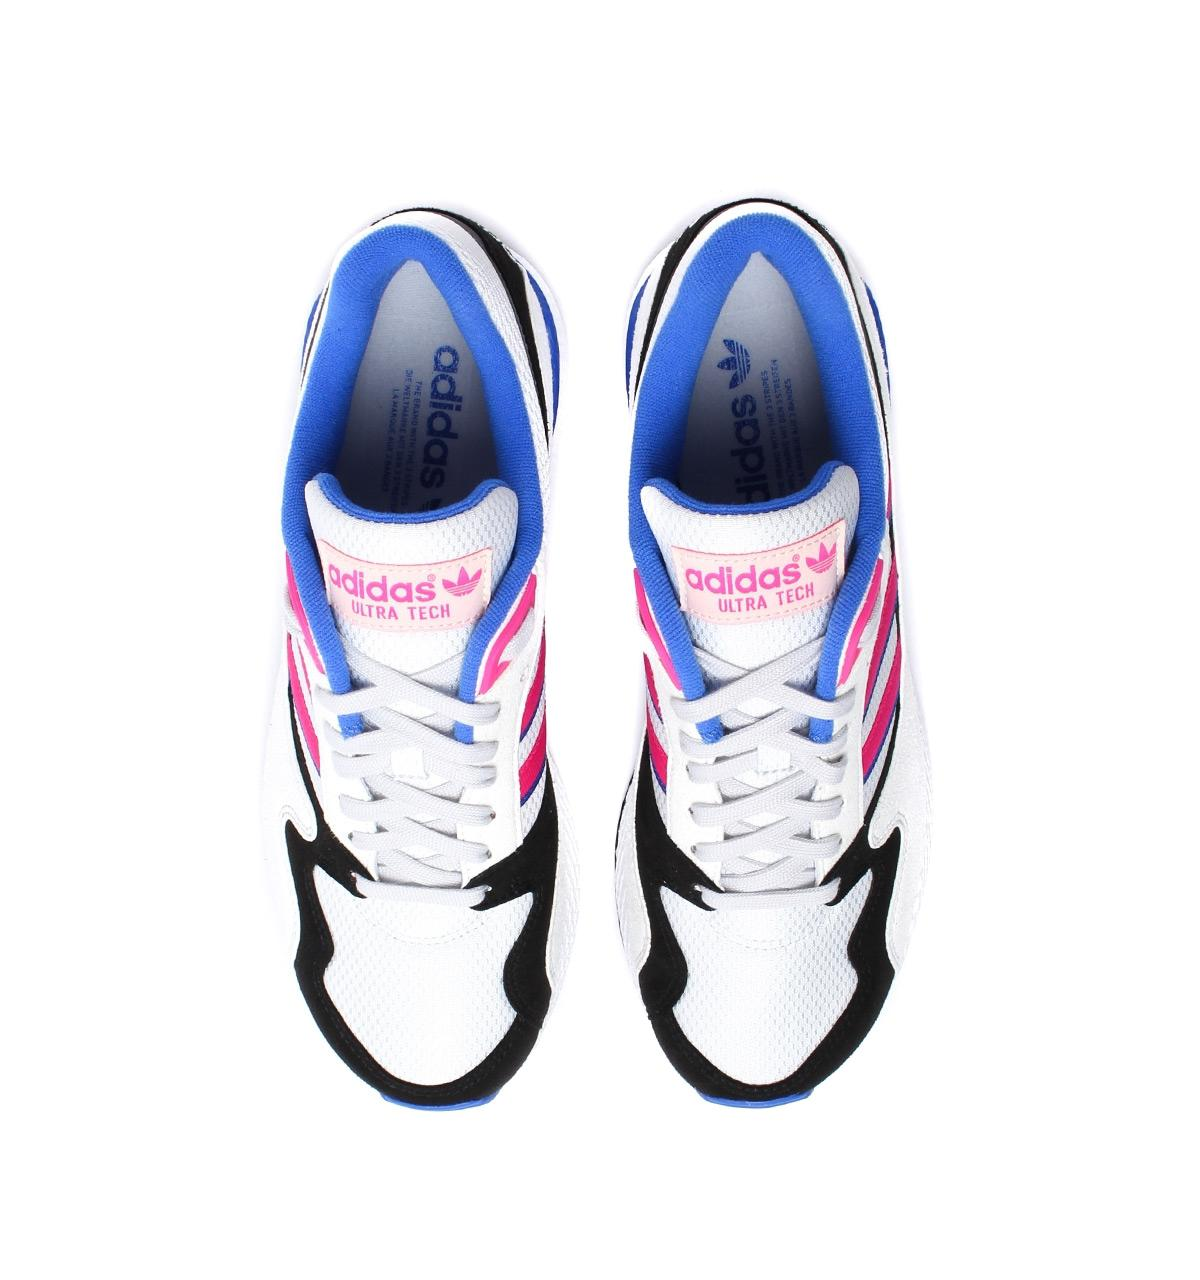 big sale 9e8e3 4971b Lyst - adidas Originals White, Pink  Black Ultra Tech in Whi